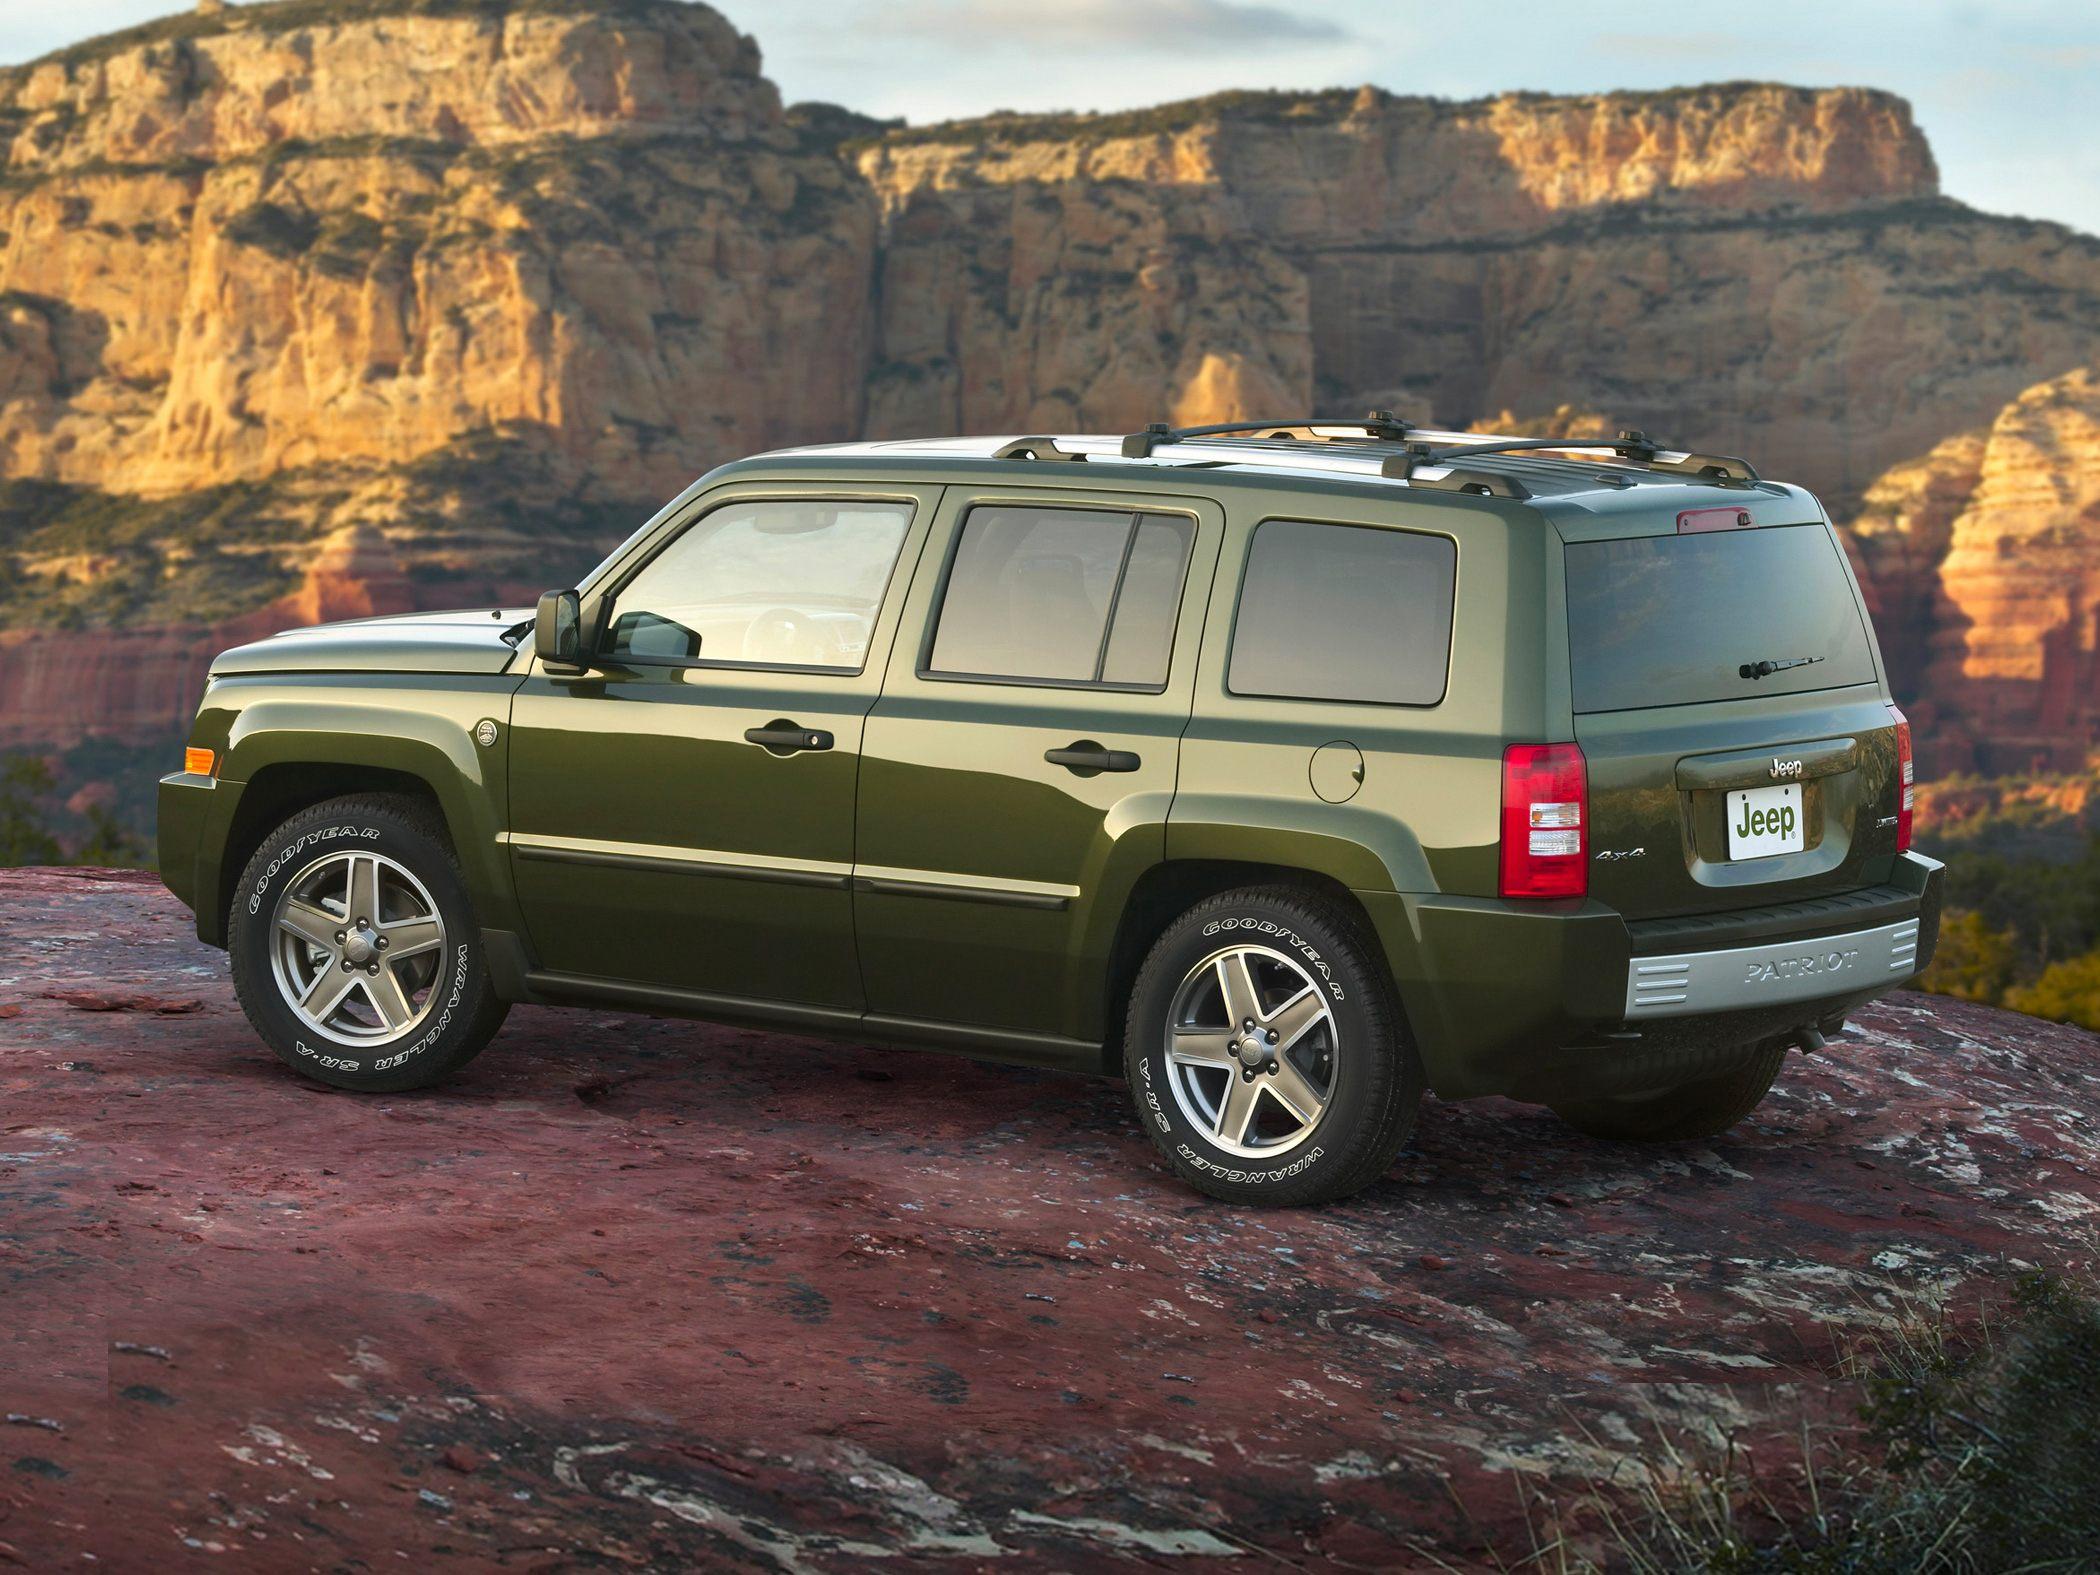 Jeep Patriot (Джип Патриот) 2021 - обзор модели c фото и видео